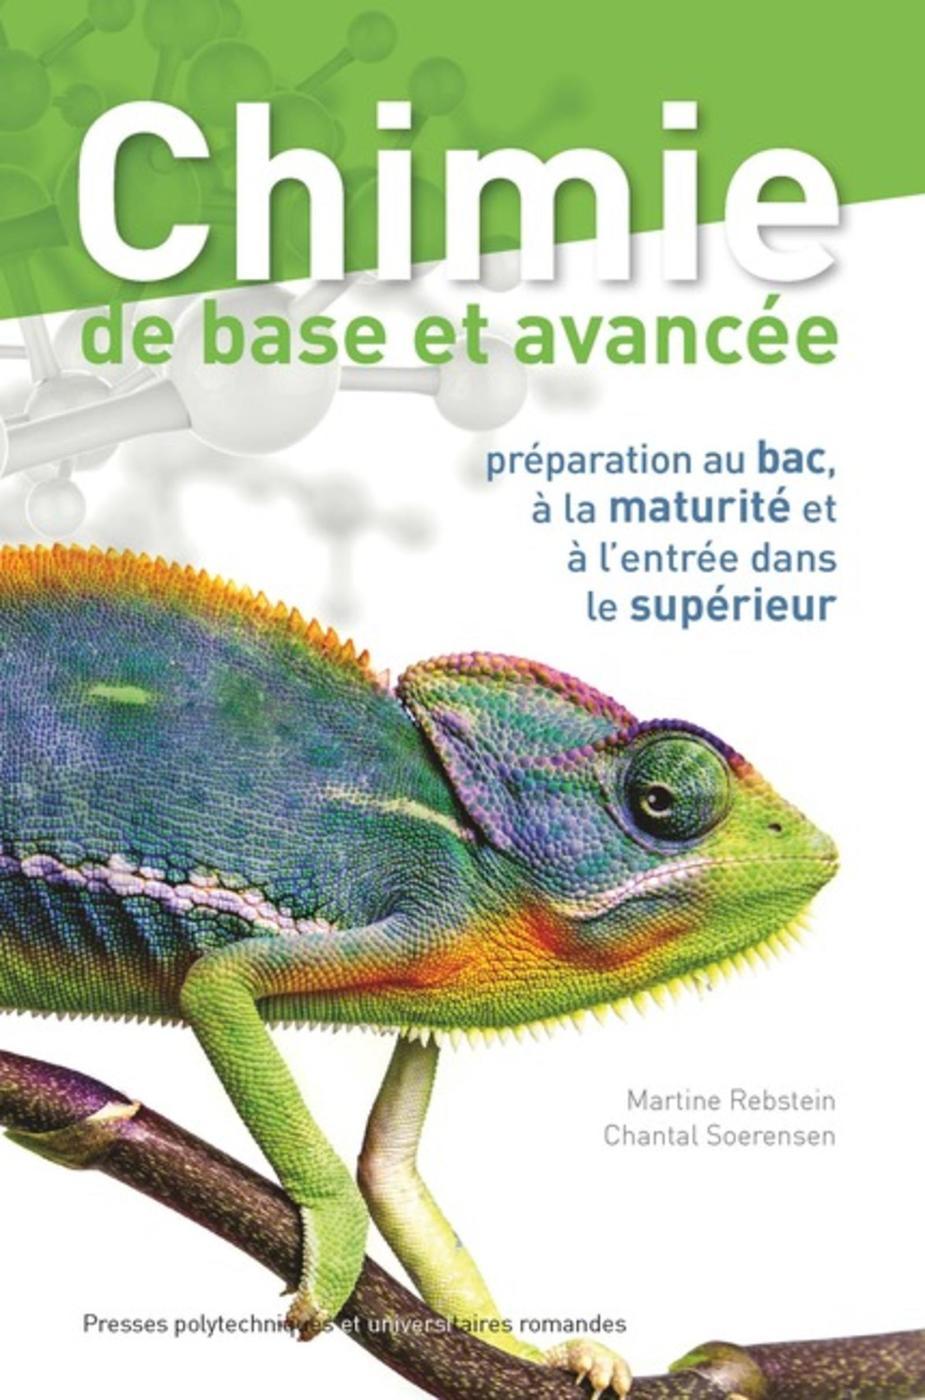 Chimie De Base Et Avancee Chantal Soerensen Martine Rebstein Librairie Eyrolles